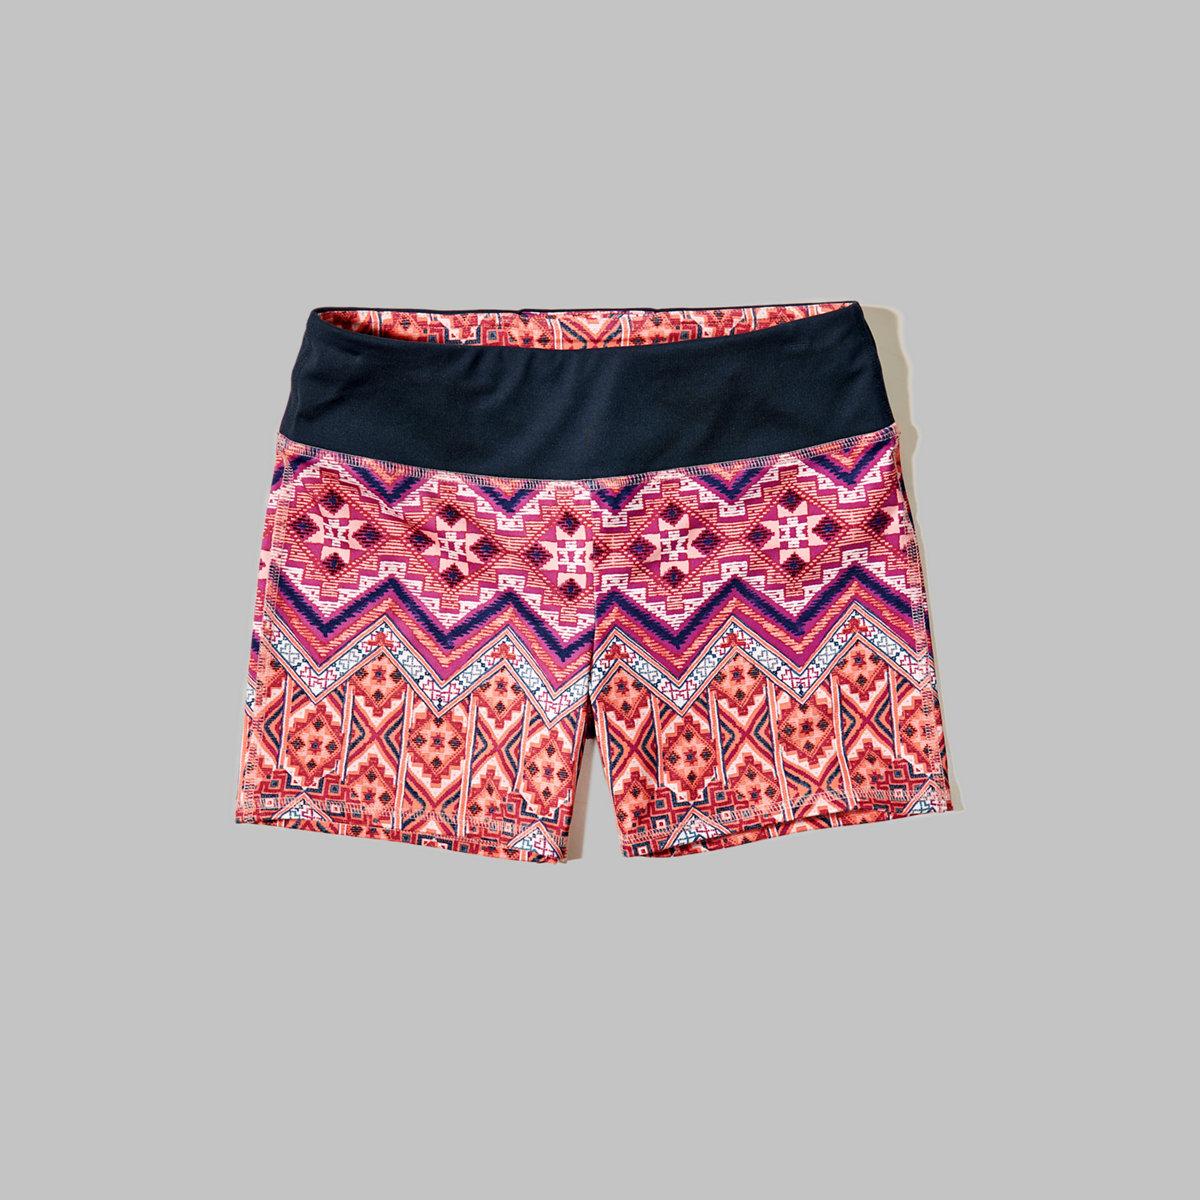 Contrast Bike Shorts